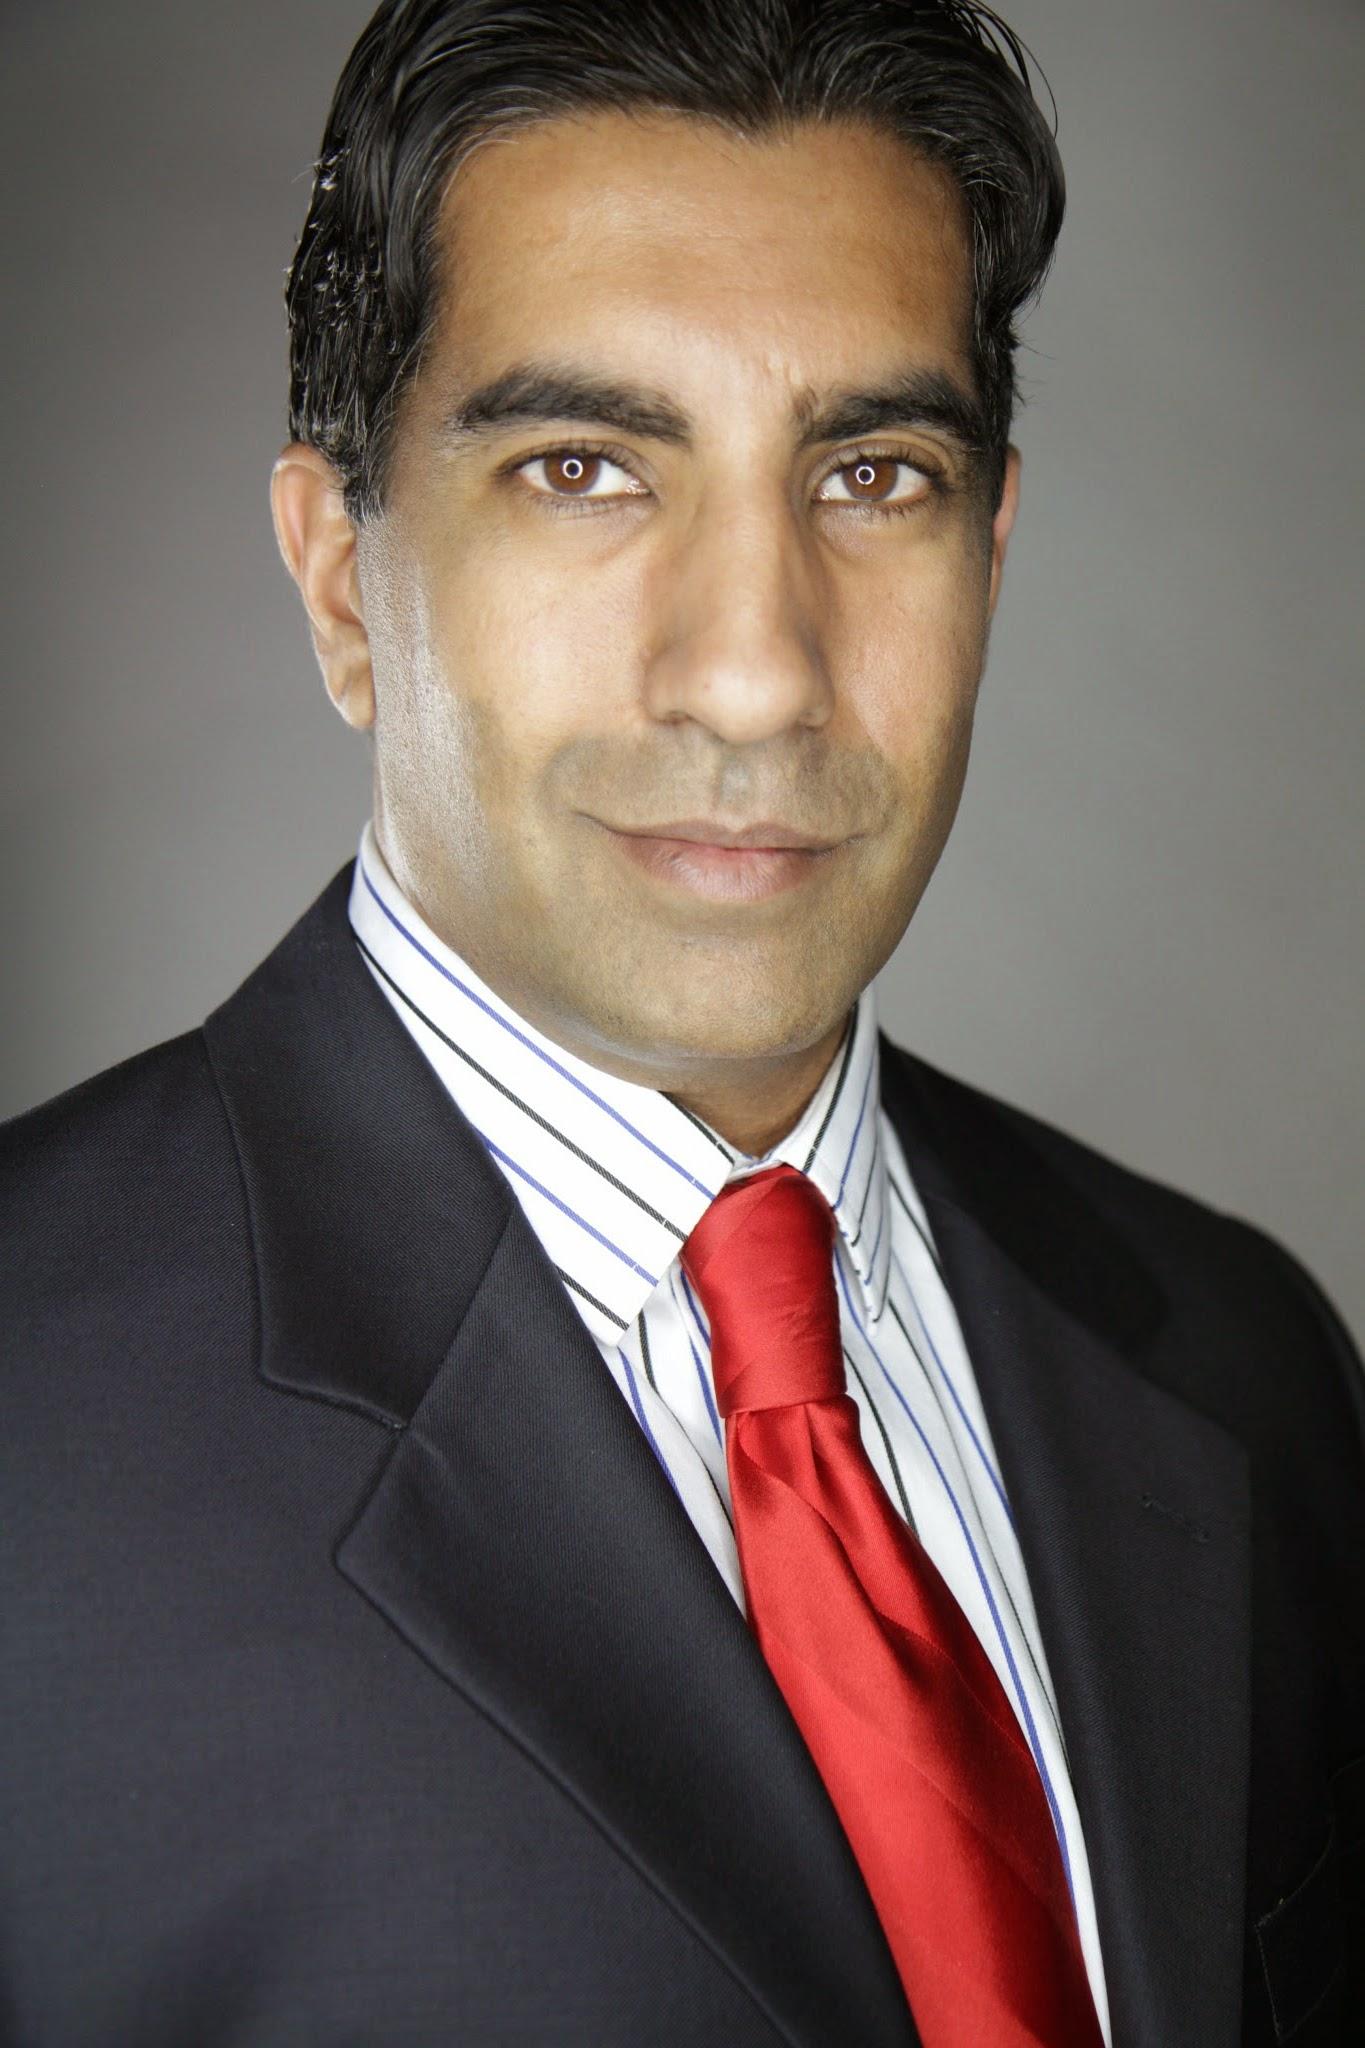 Dr. Rishi Khatri